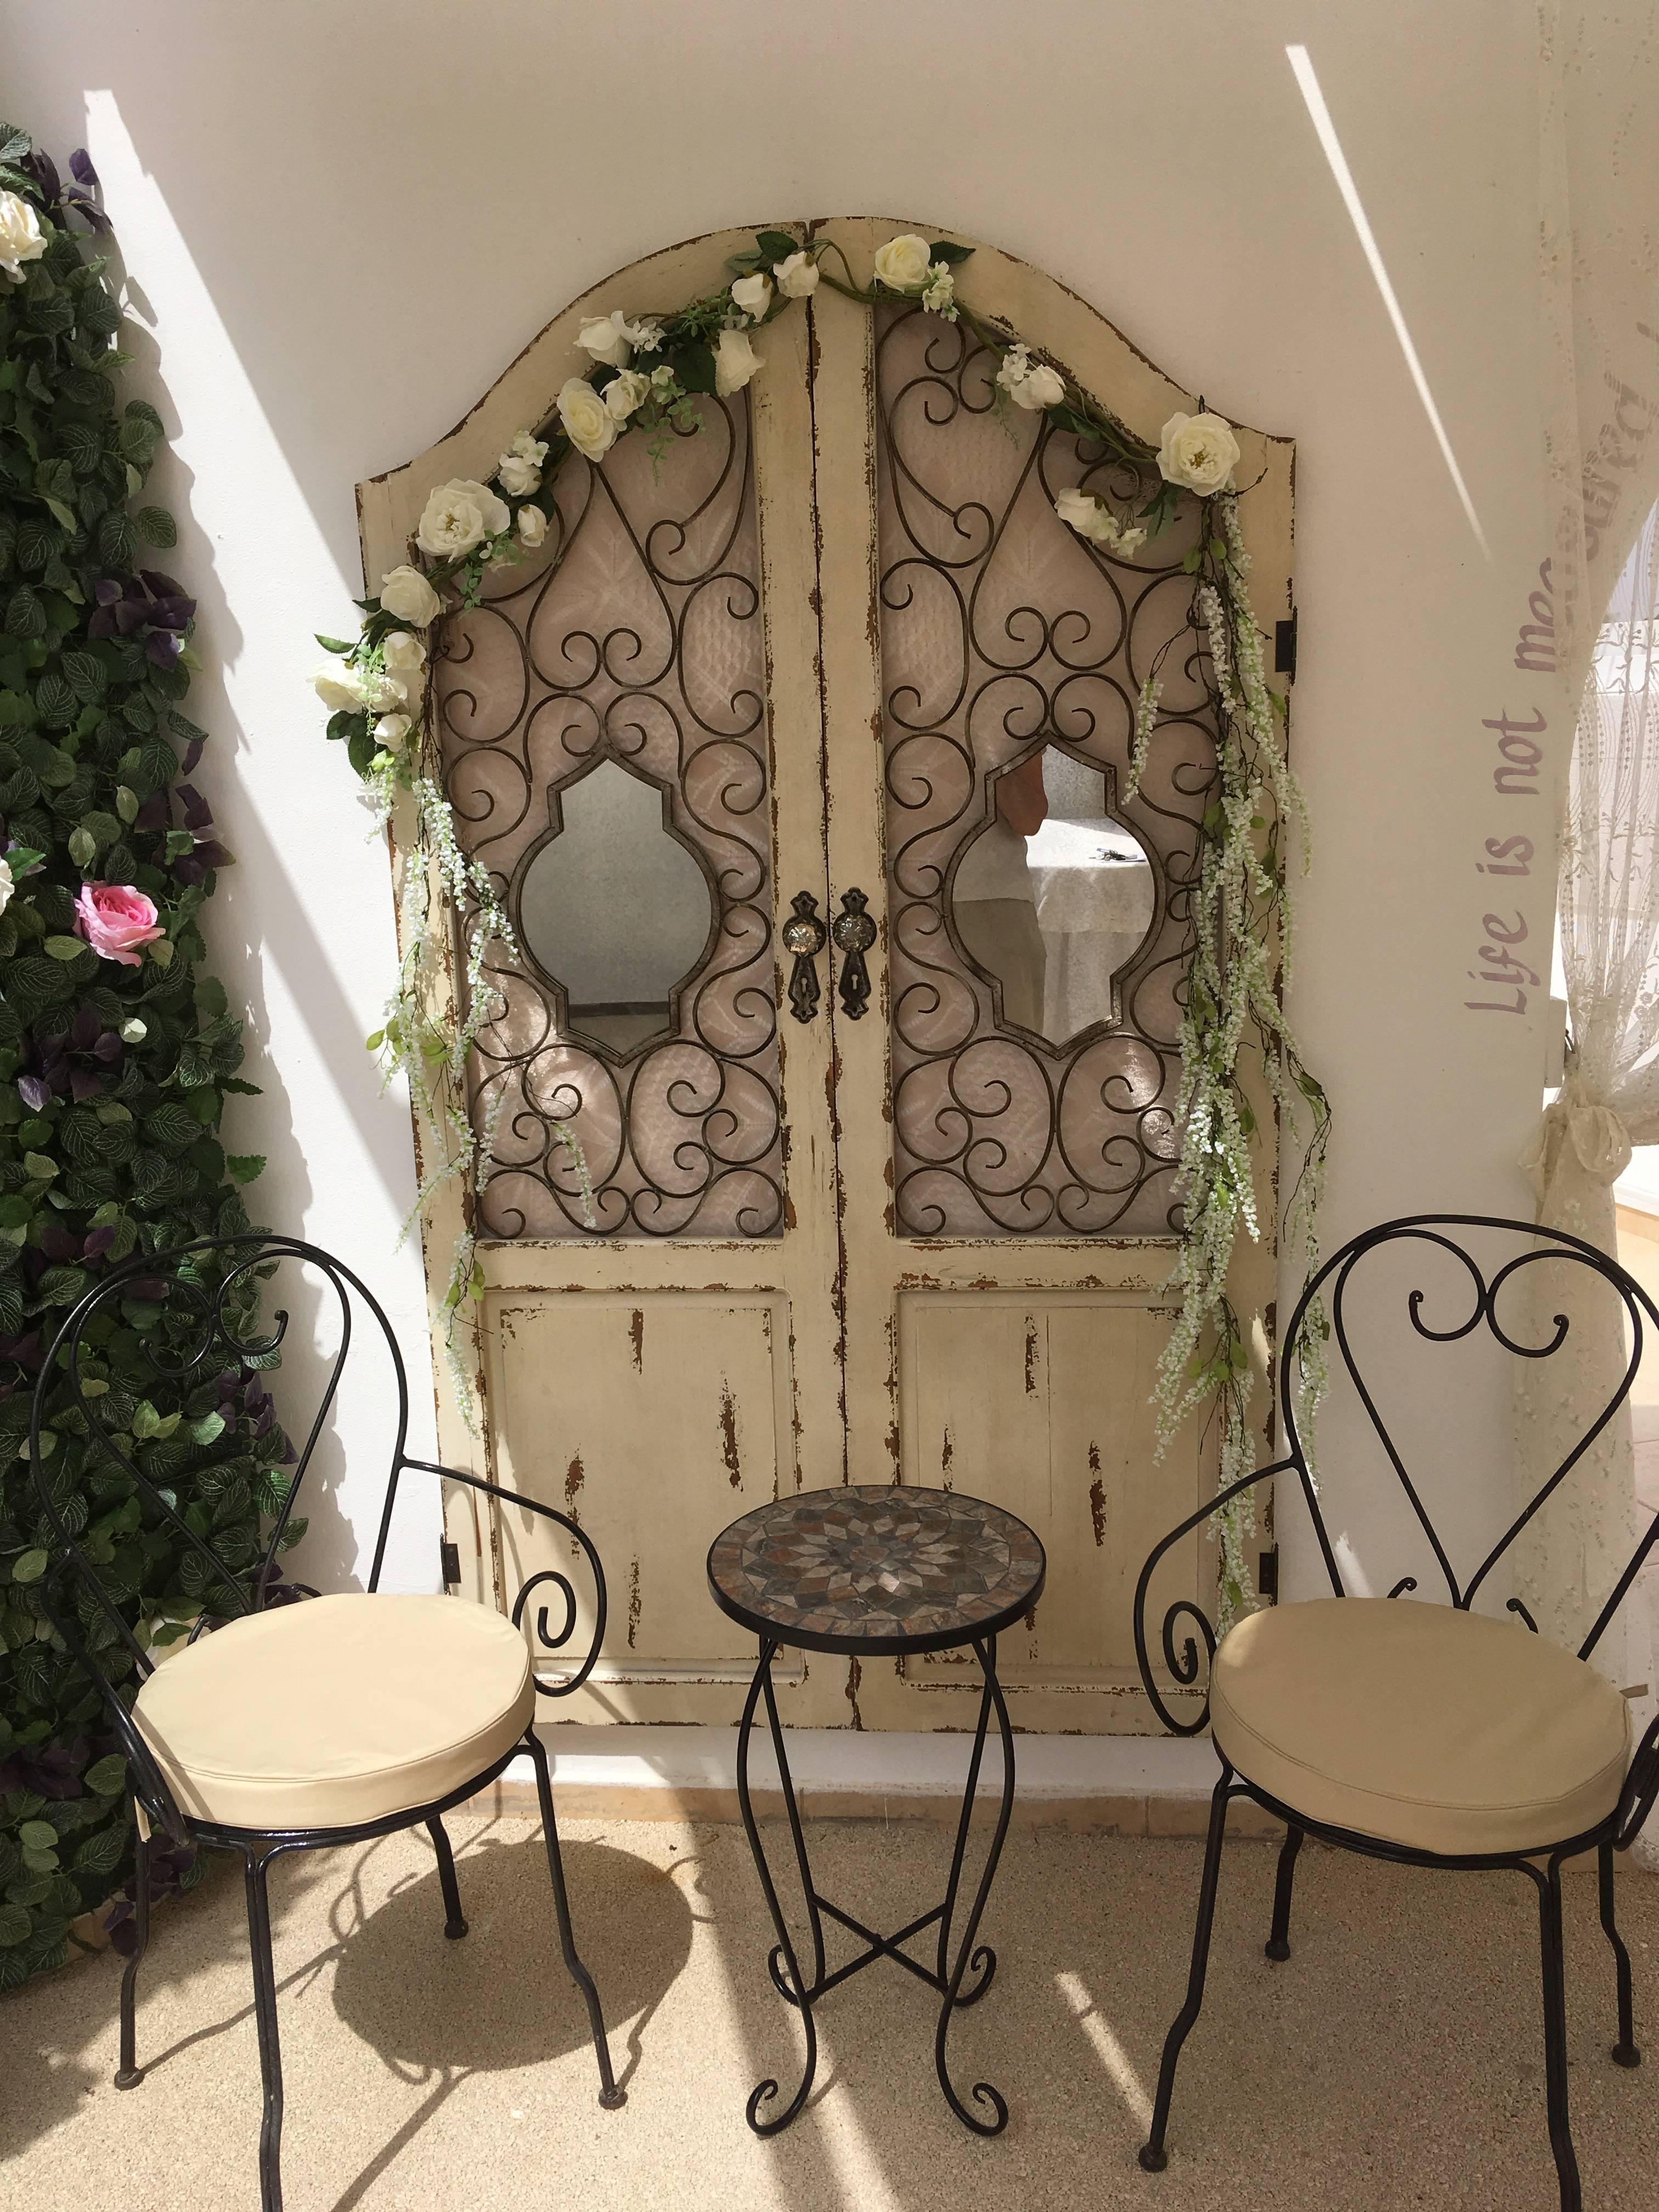 Vintage doors for photo oppurtunity.